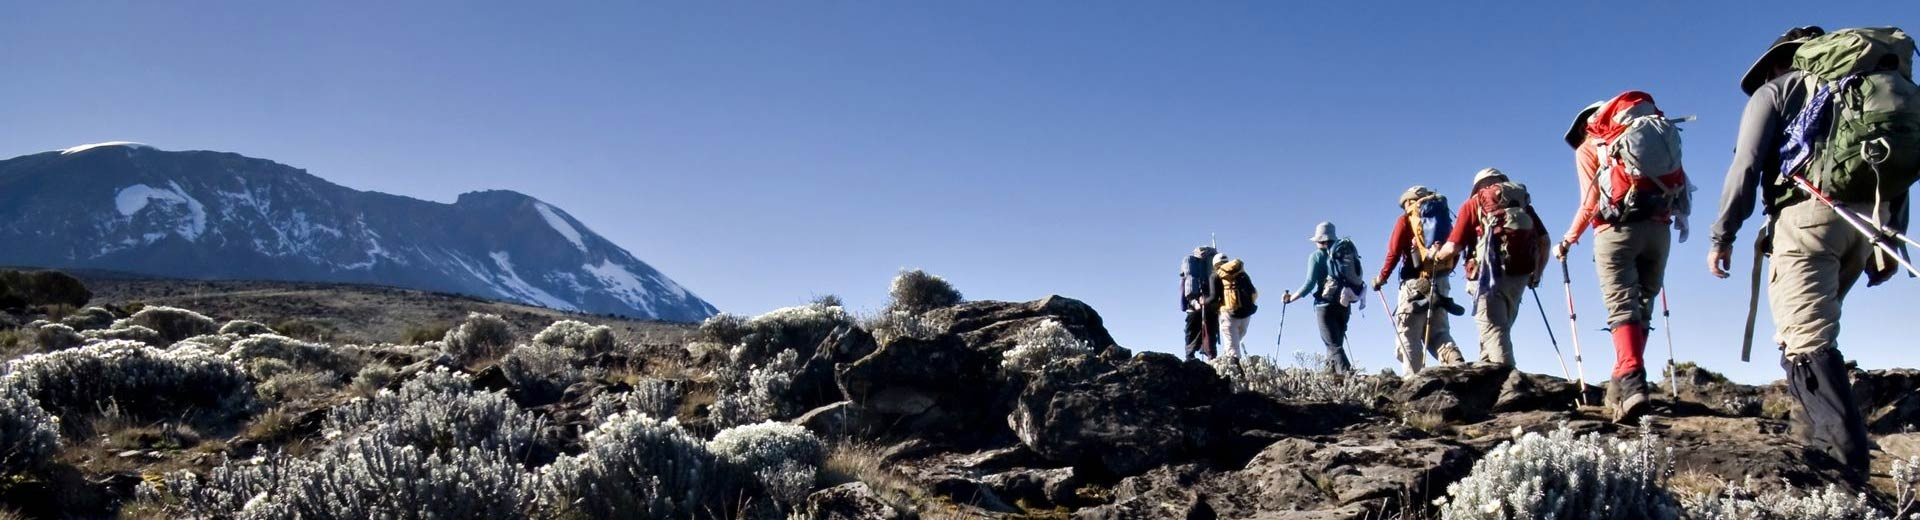 Kilimanjaro 8 Days Lemosho Route